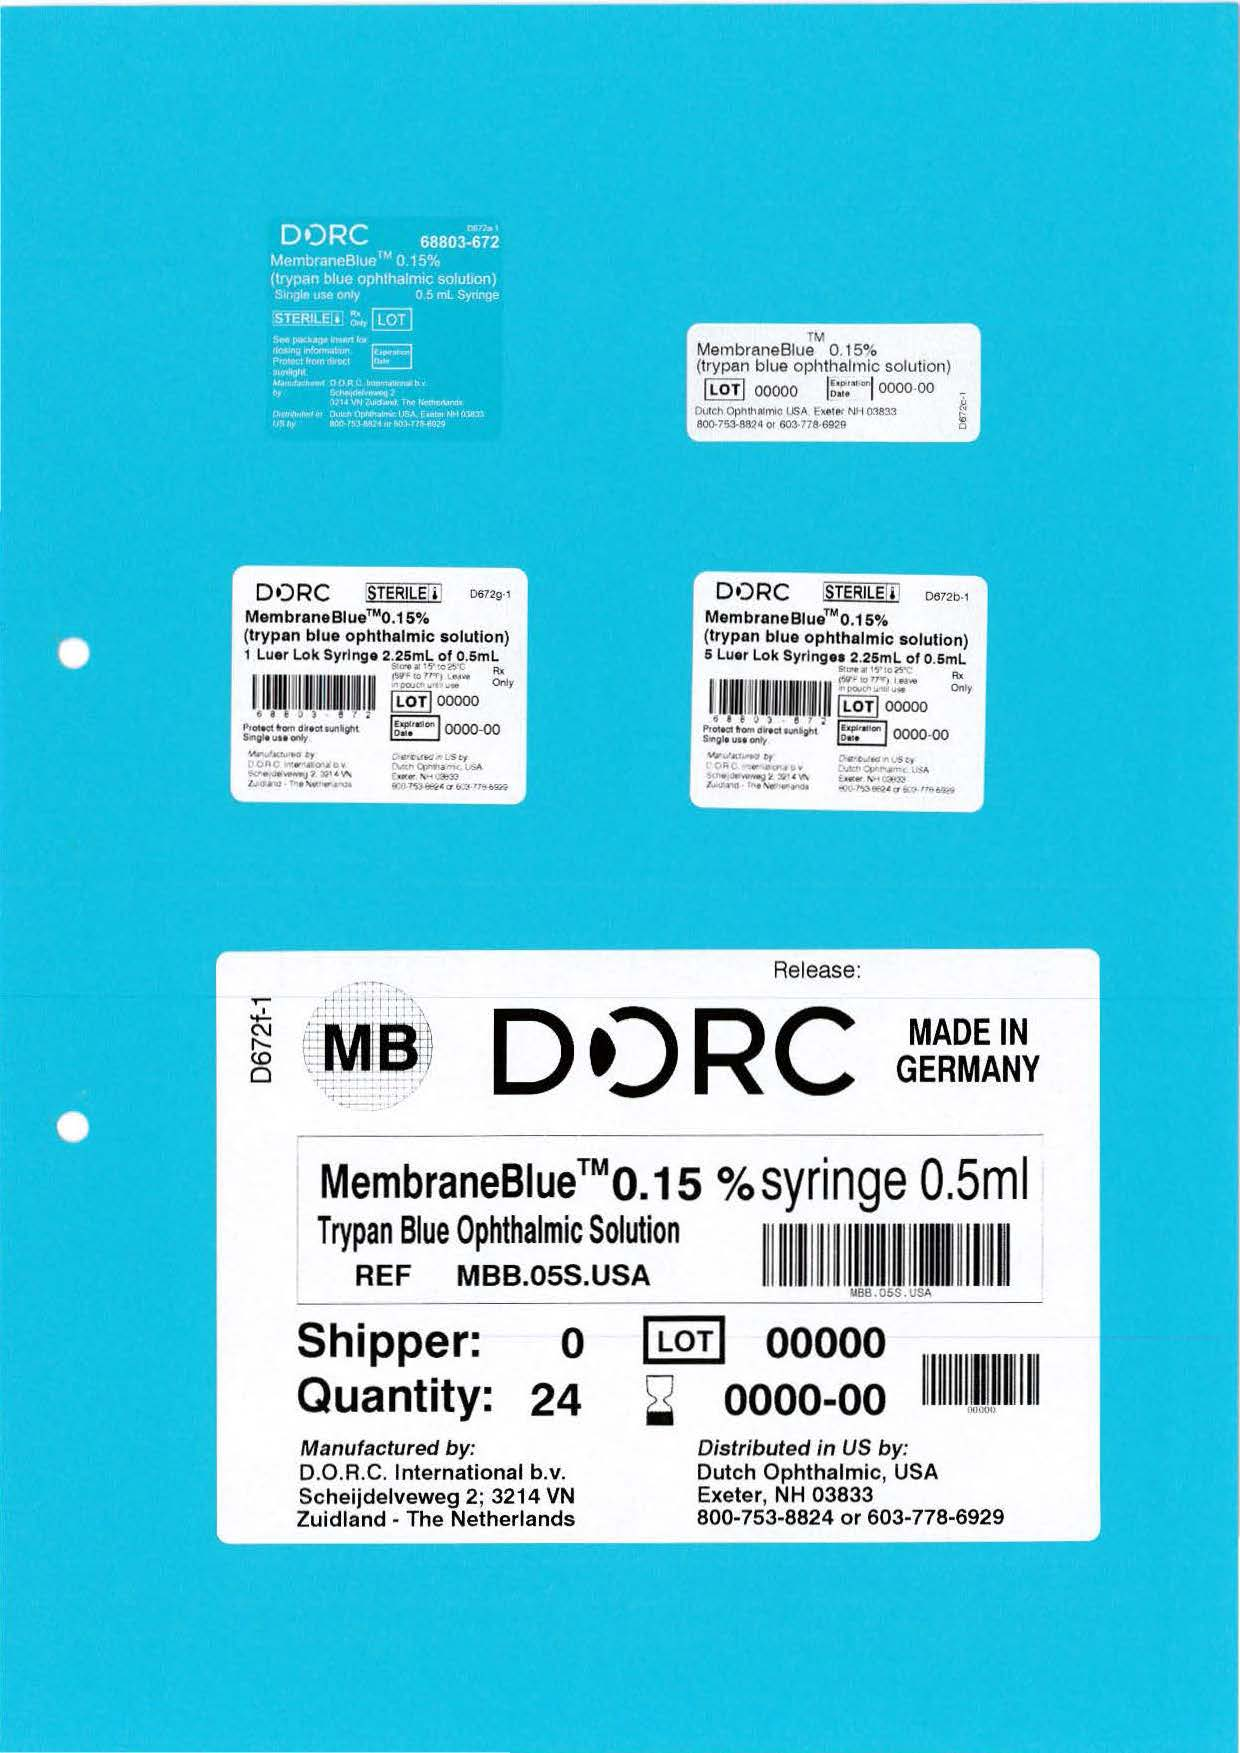 MembraneBlue - labelling